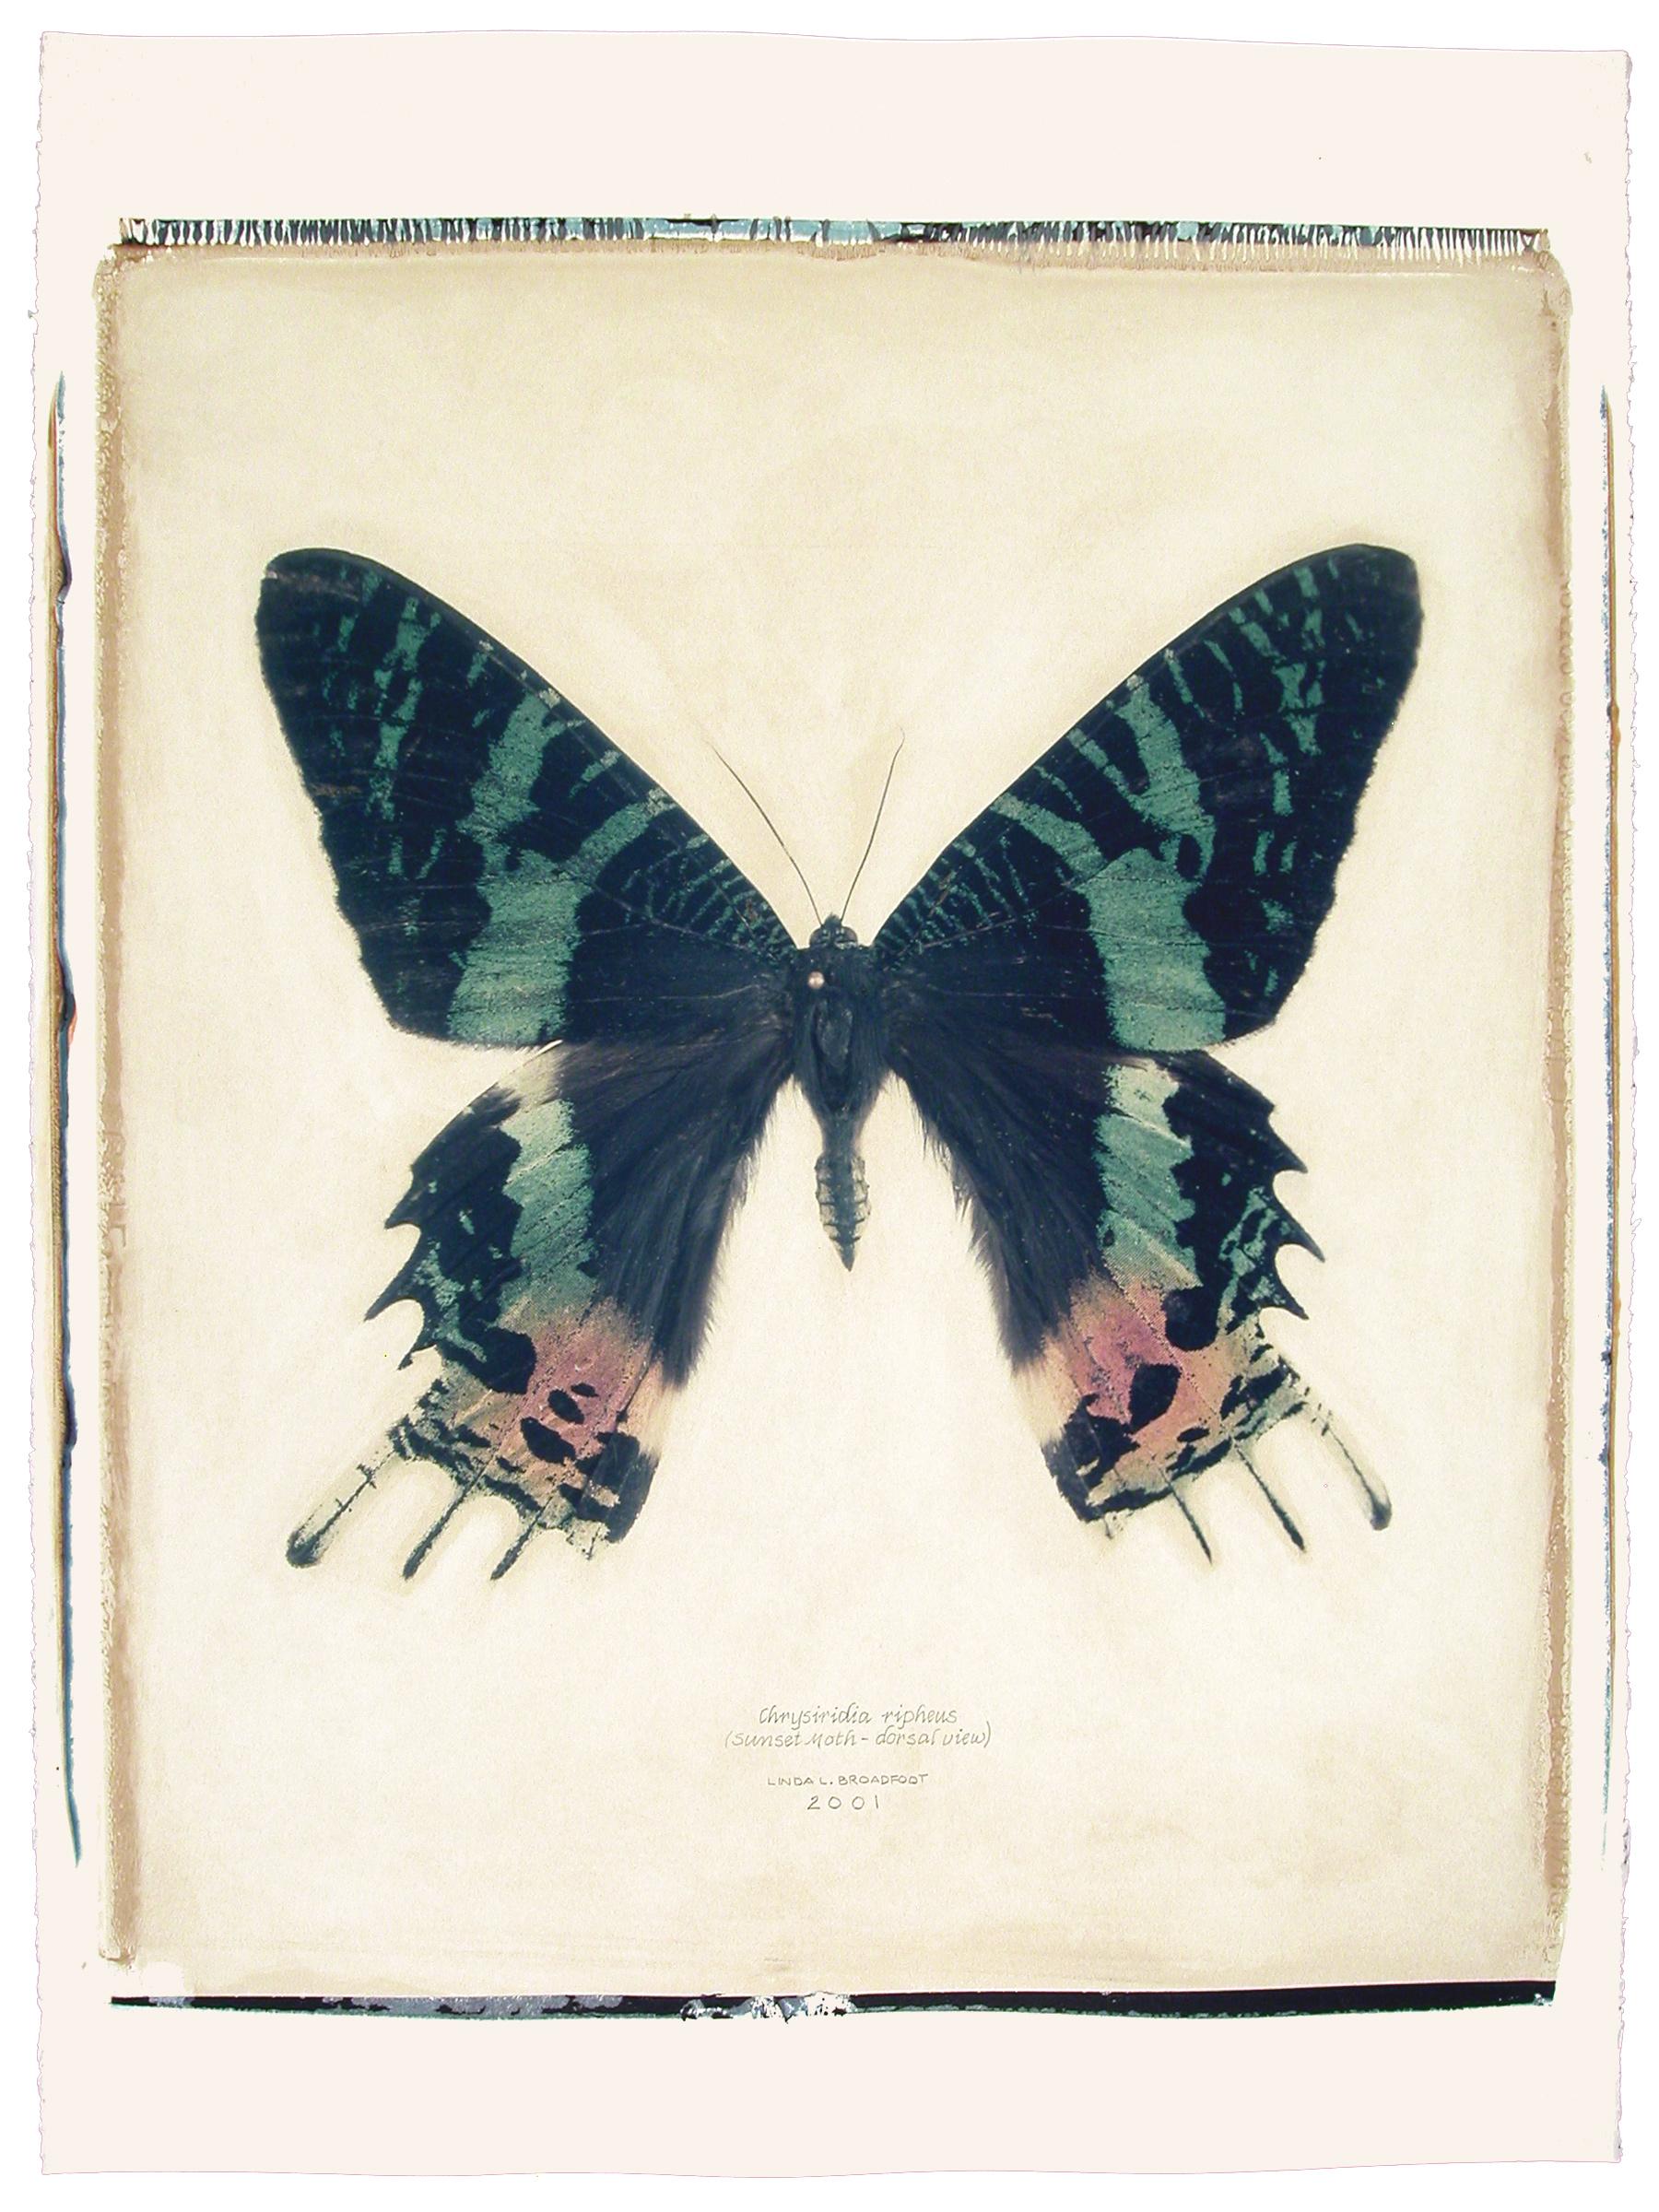 Chrysiridia ripheus  (Sunset Moth), dorsal view, 2001